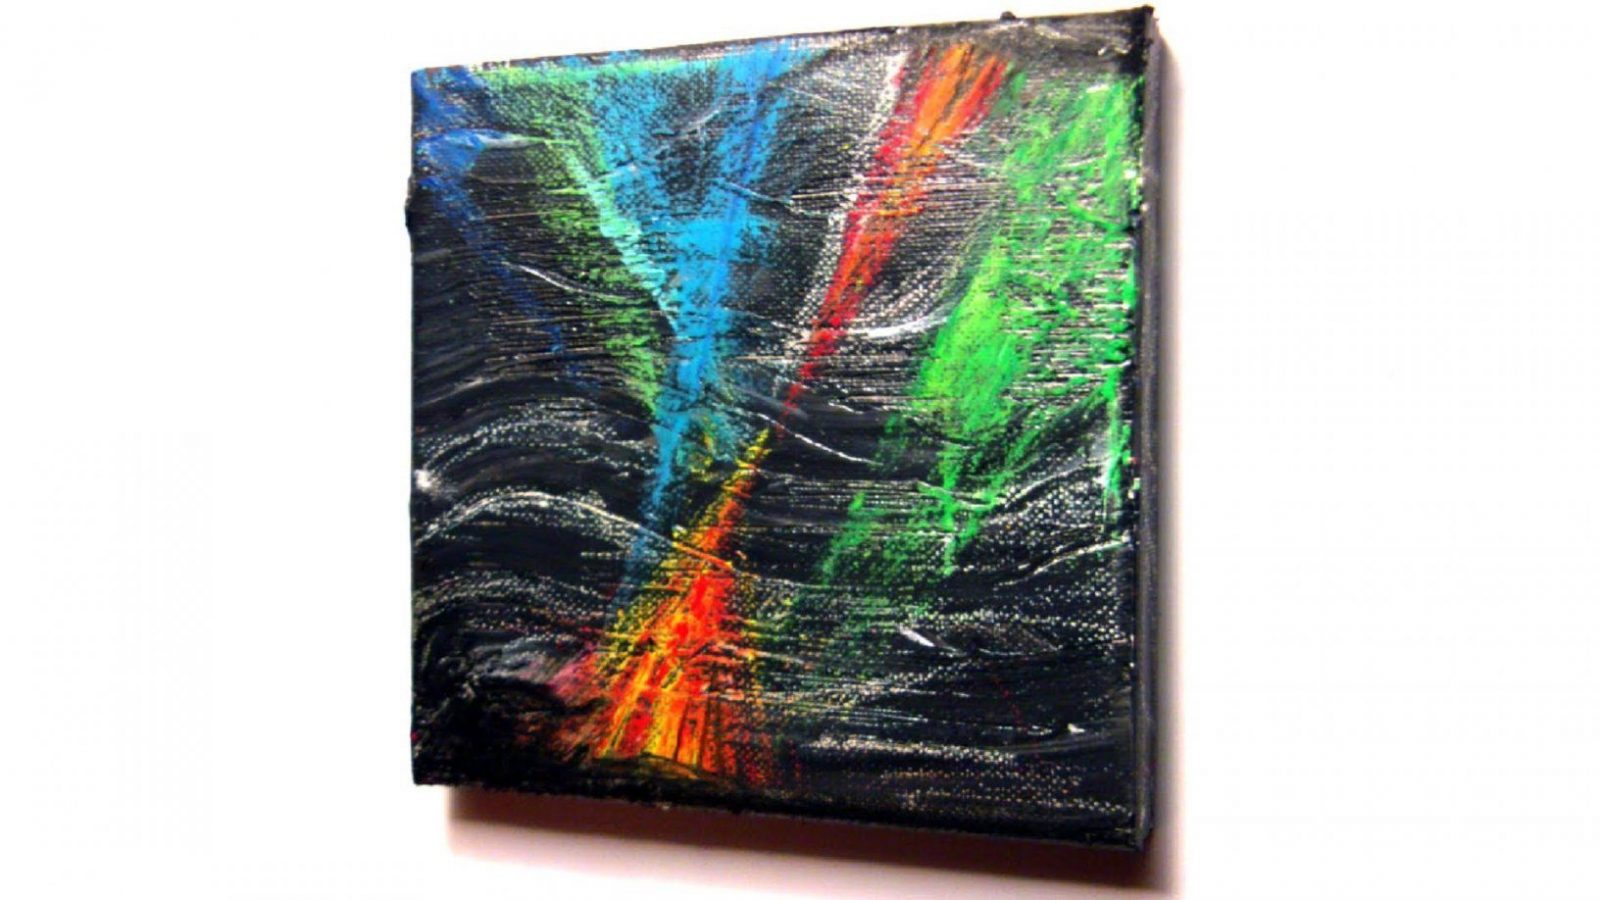 Abstrakt Malen Mit Acryl Und Ölkreide (Abstract Painting